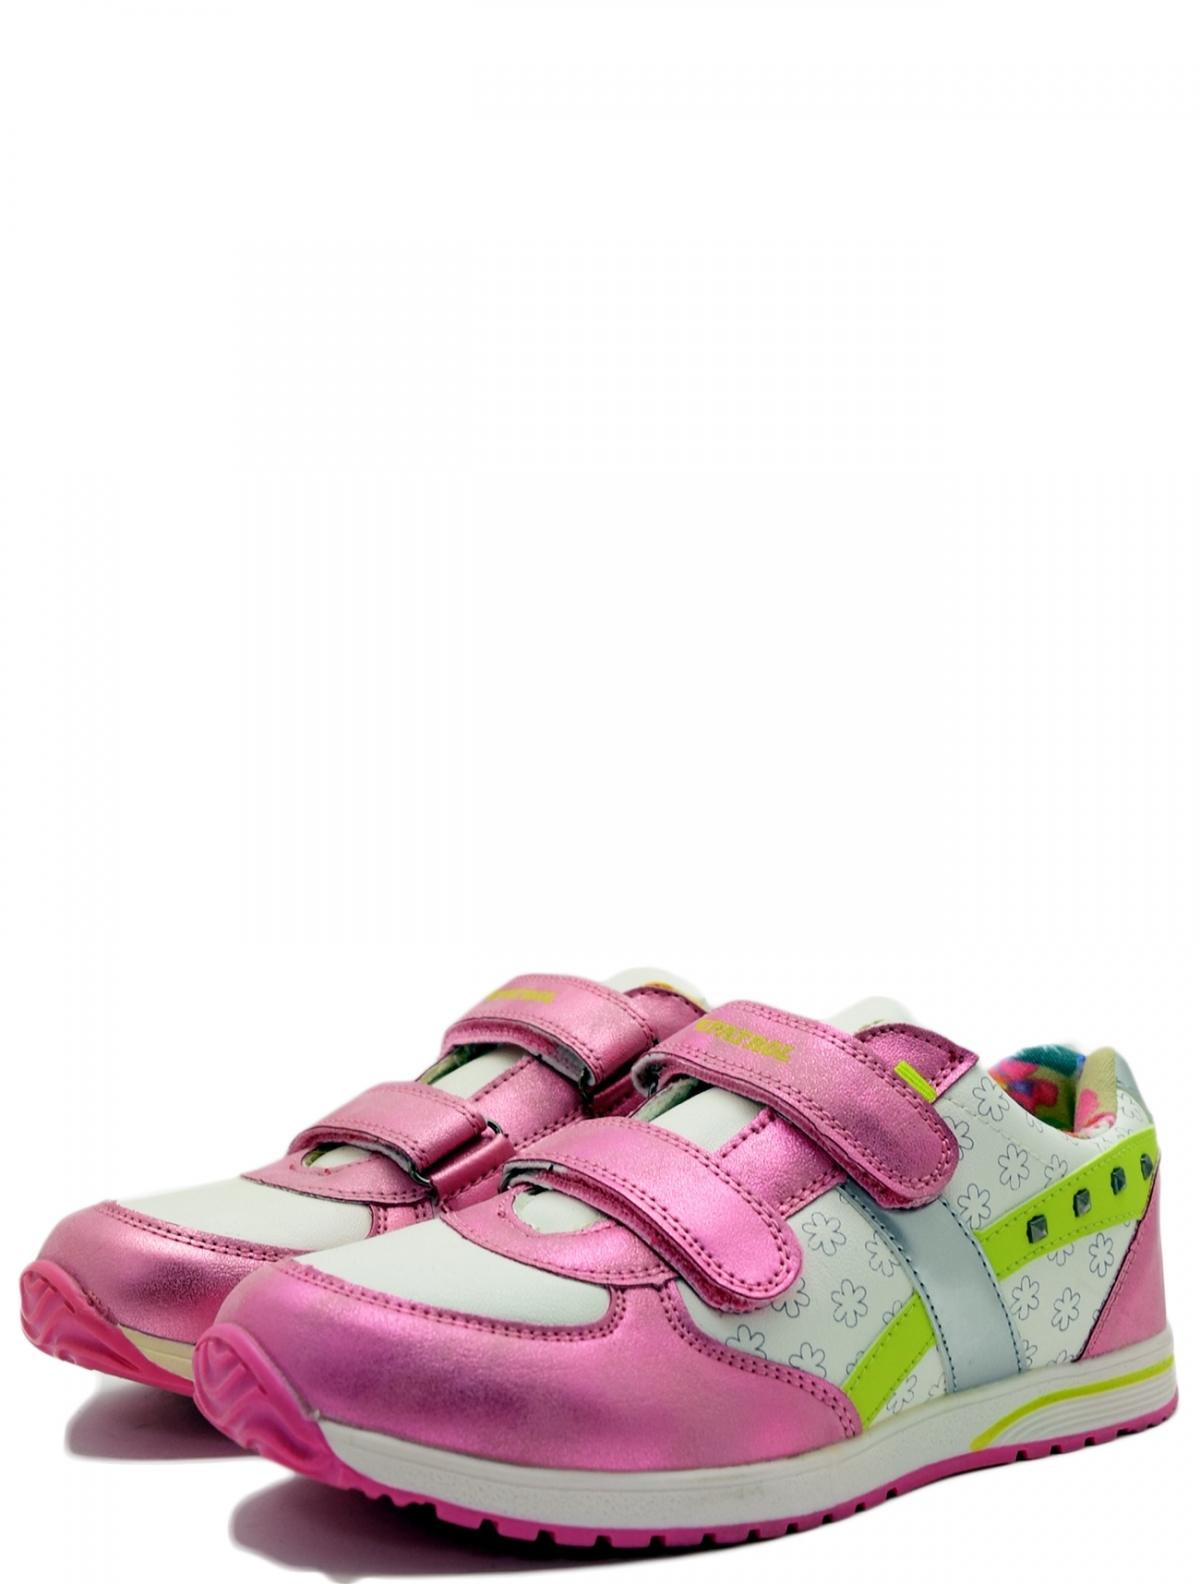 933-408T-15S-01-17 кроссовки для девочки